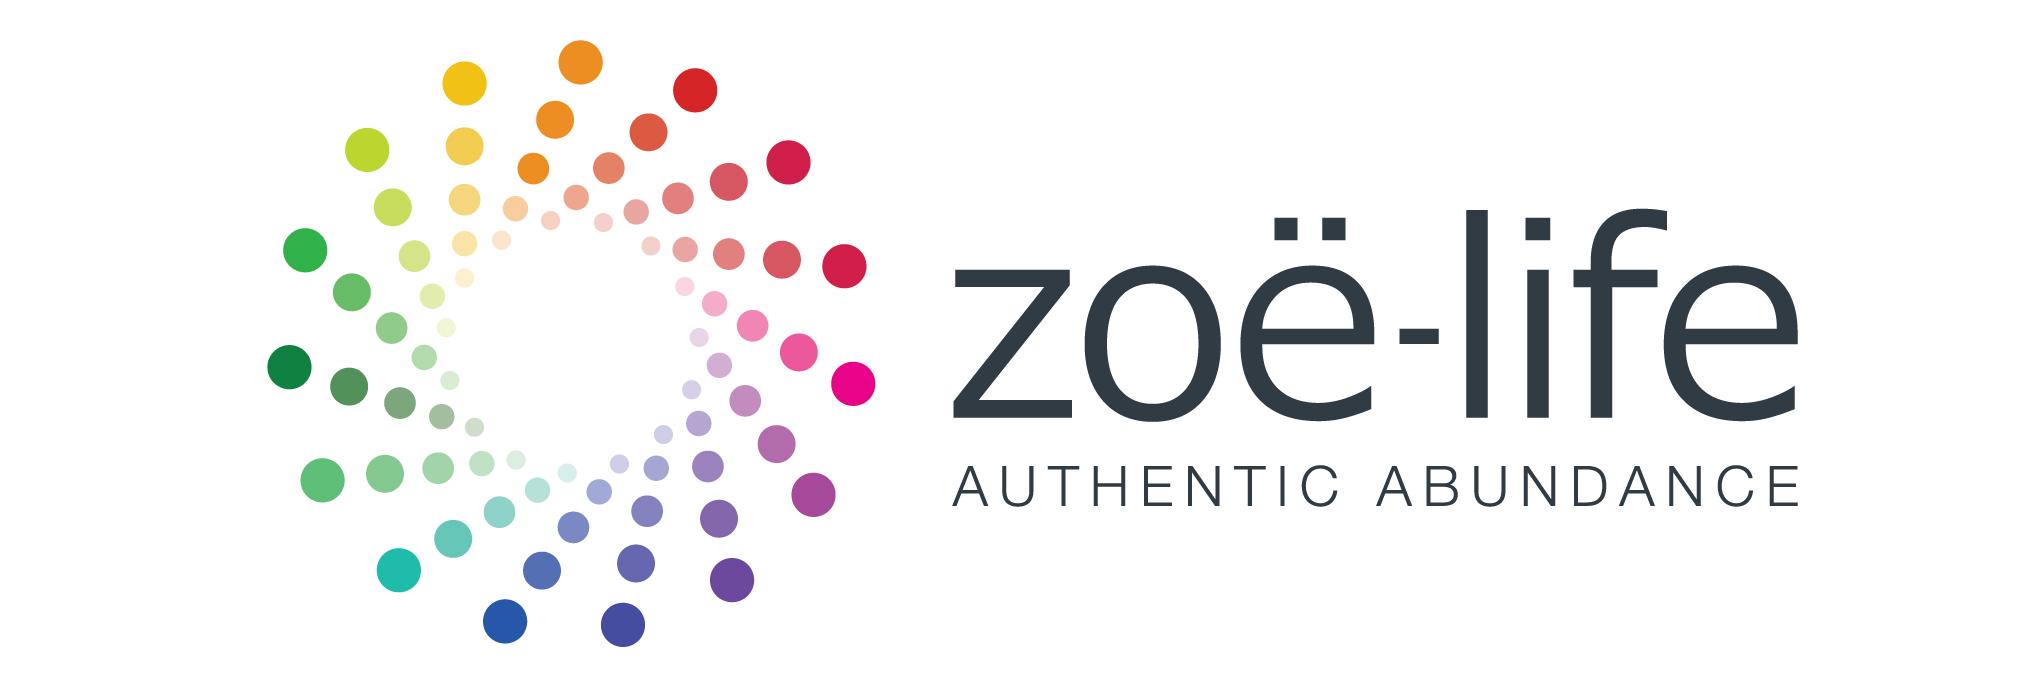 Zoe life